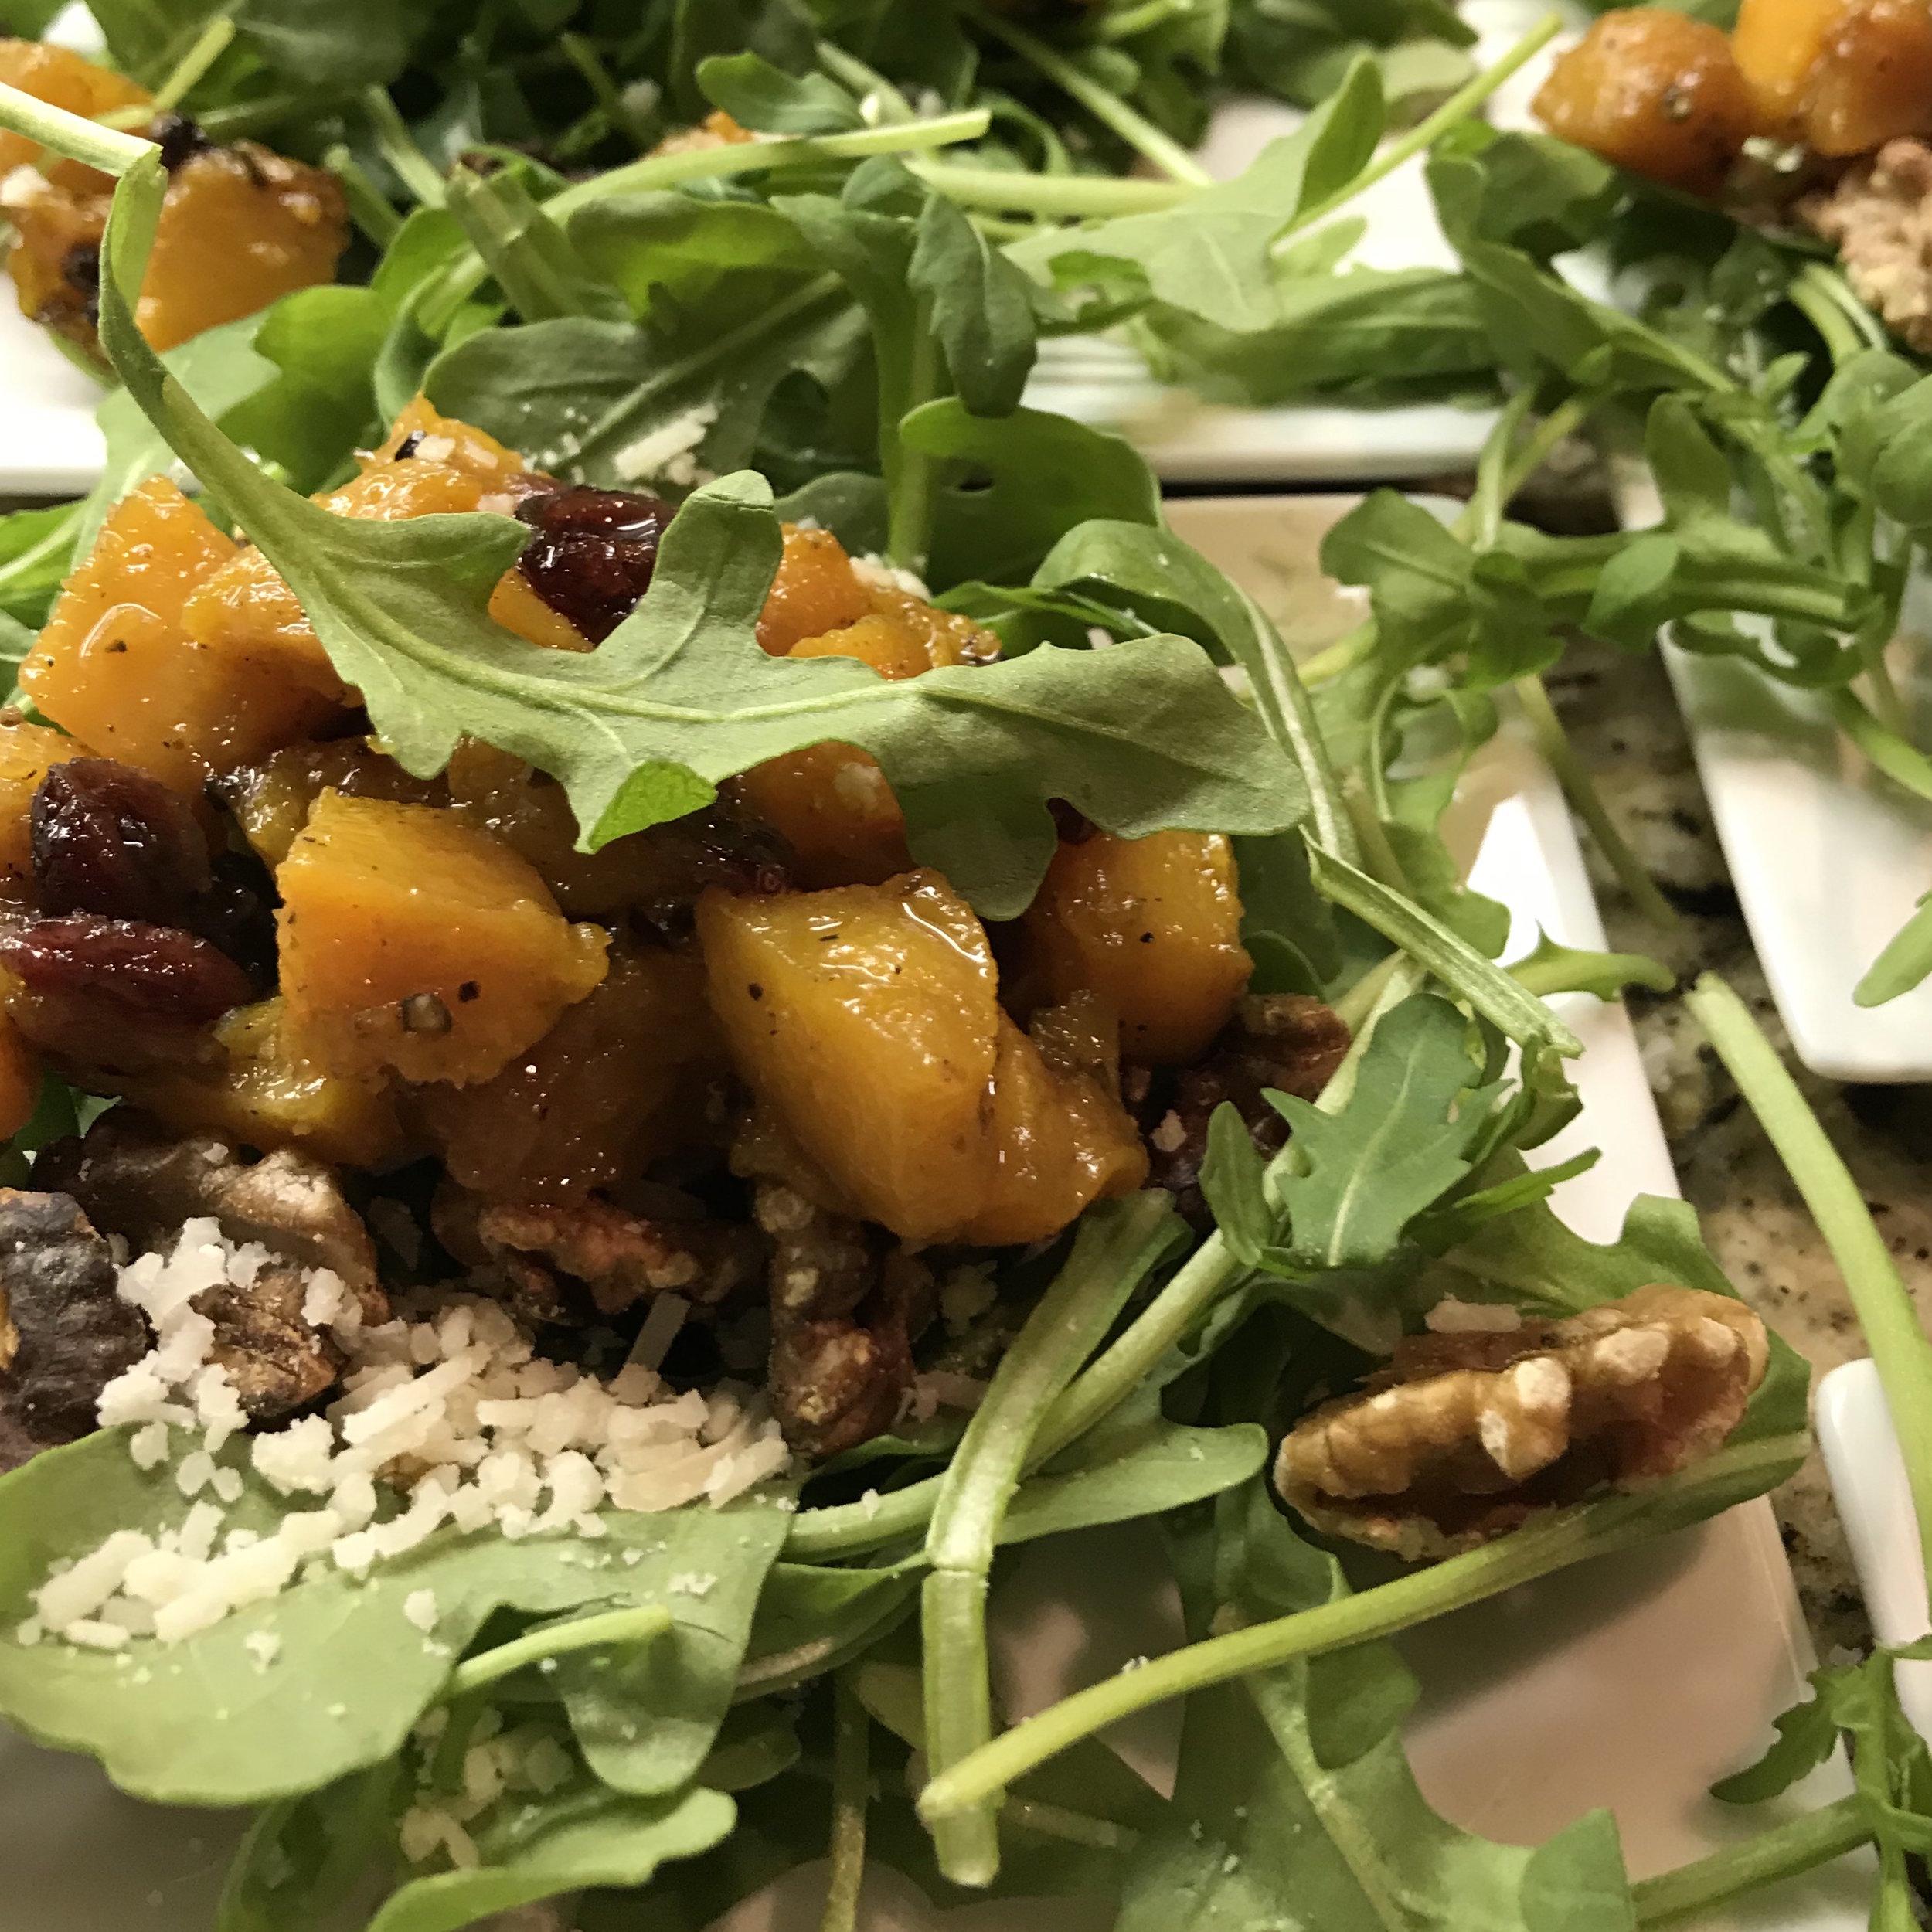 Roasted Butternut Squash Salad with Warm Cider Vinaigrette . Back to Basics . Week 8